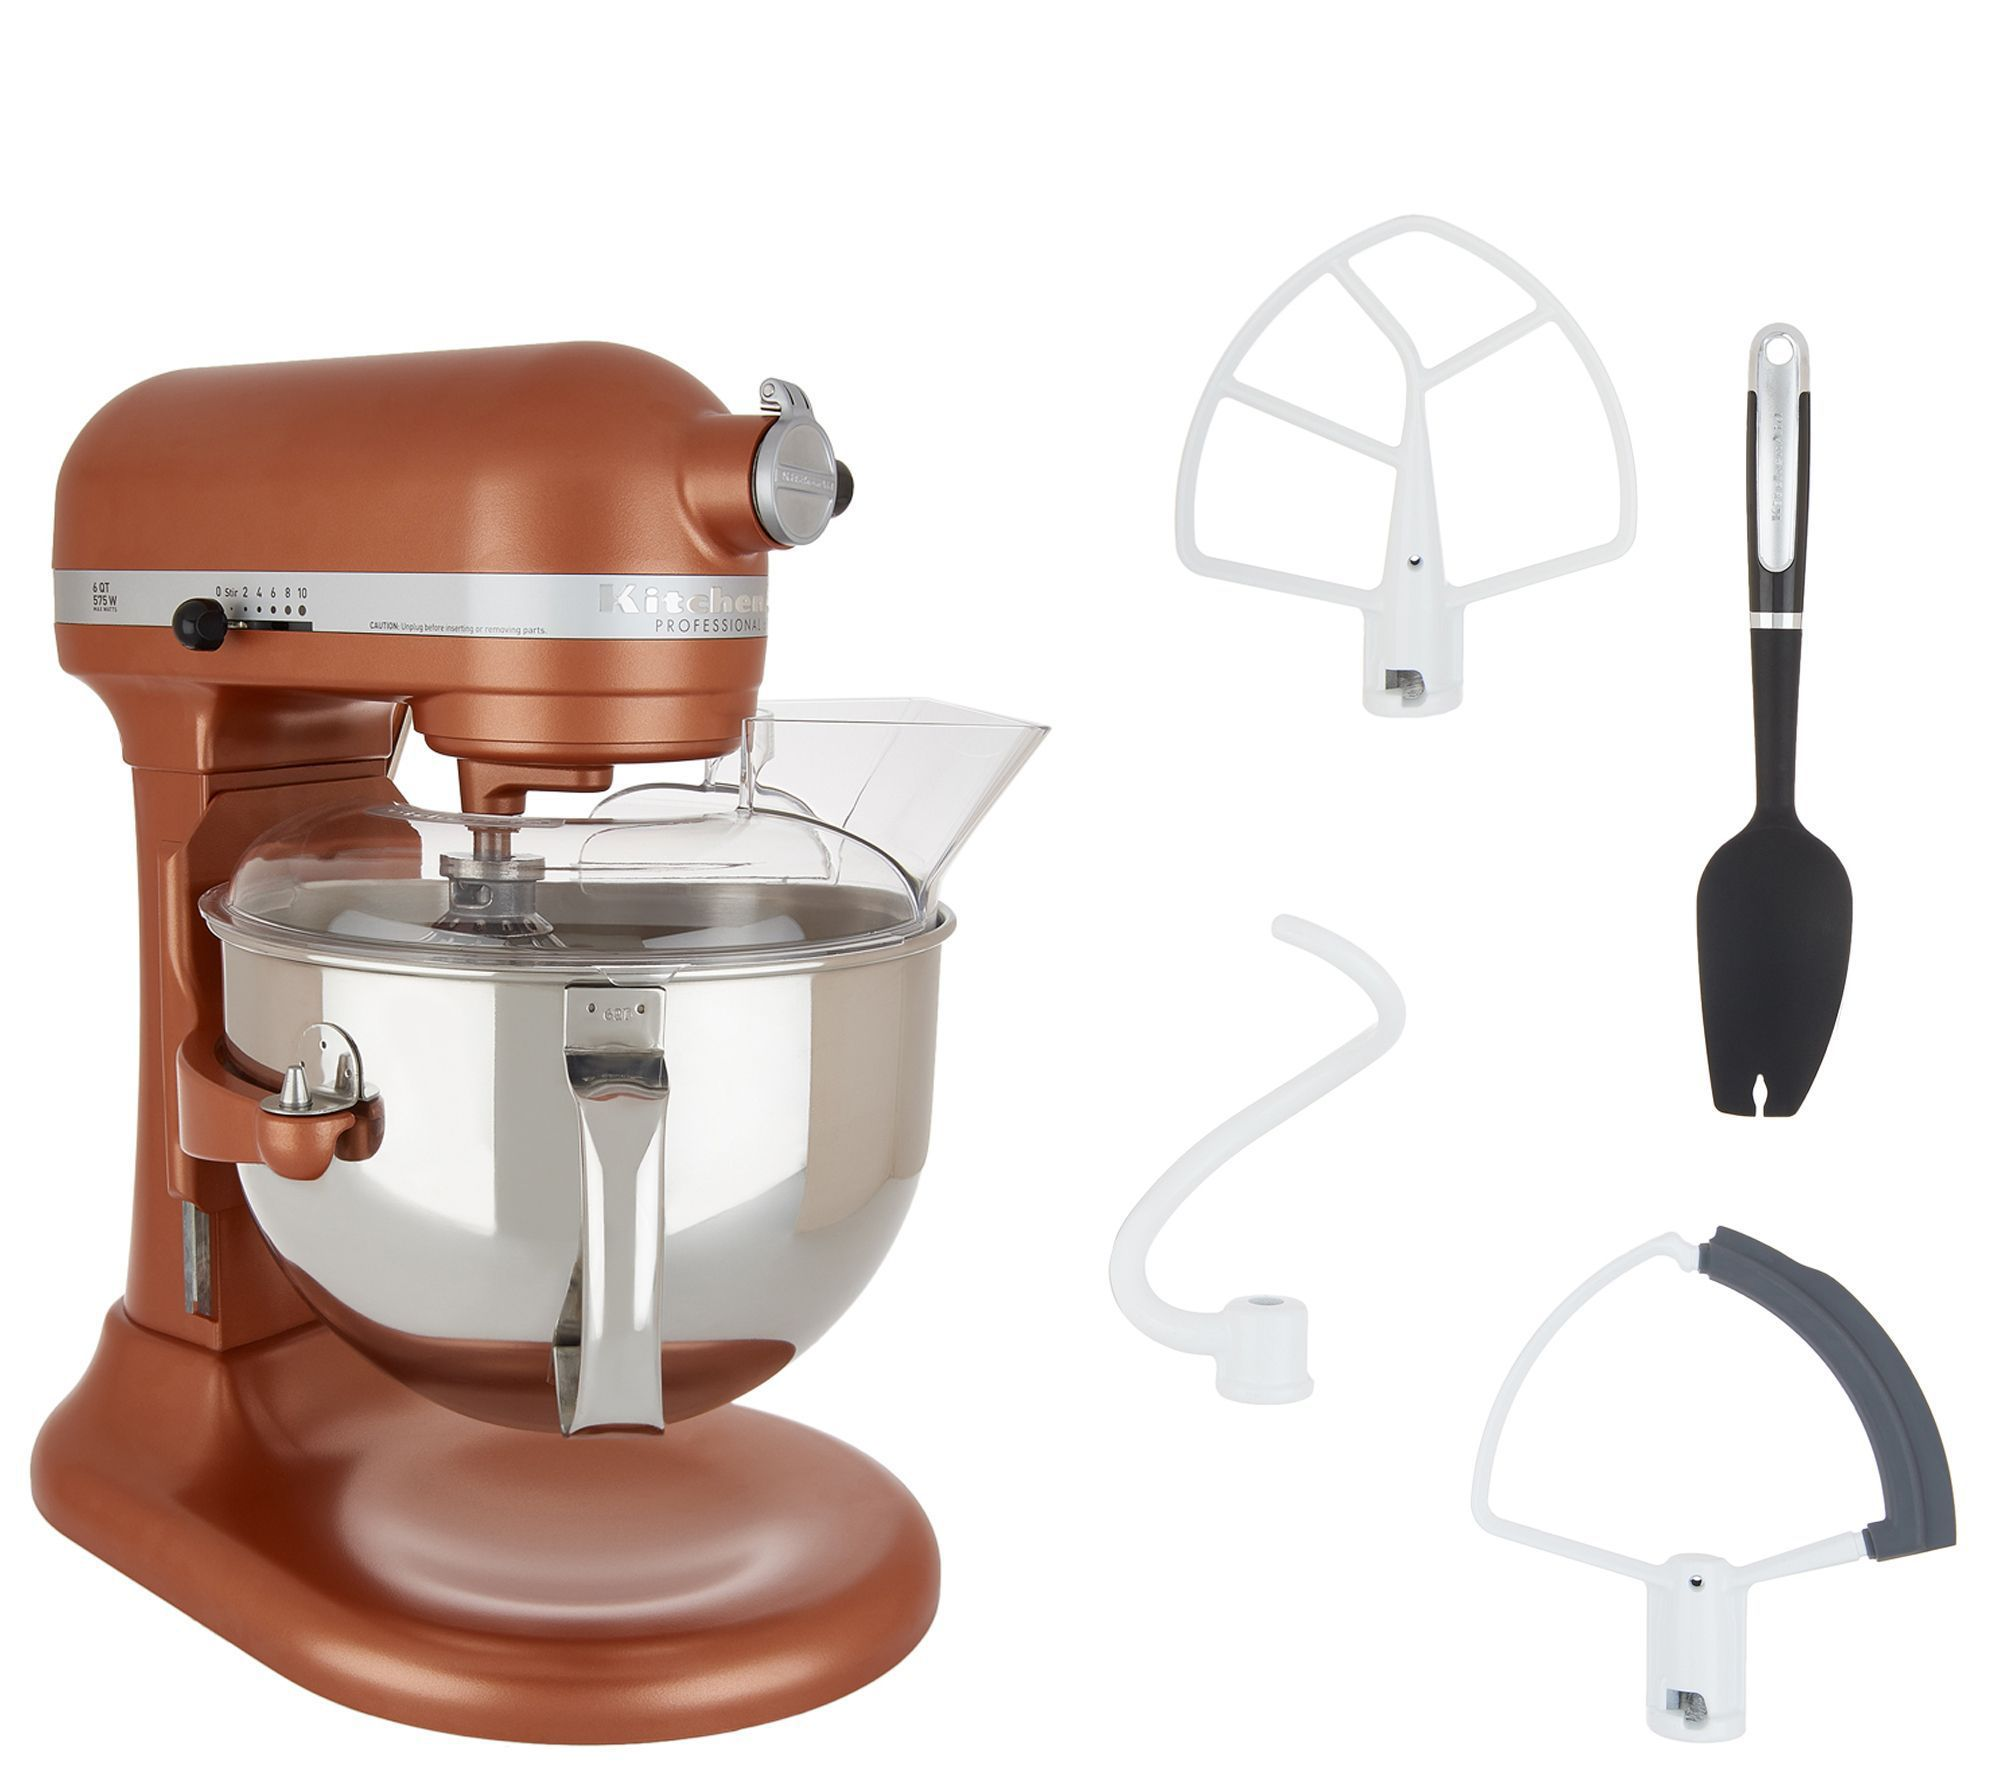 Kitchenaid Pro 600 6 Qt Bowl Lift Stand Mixer W Flex Edge Beater